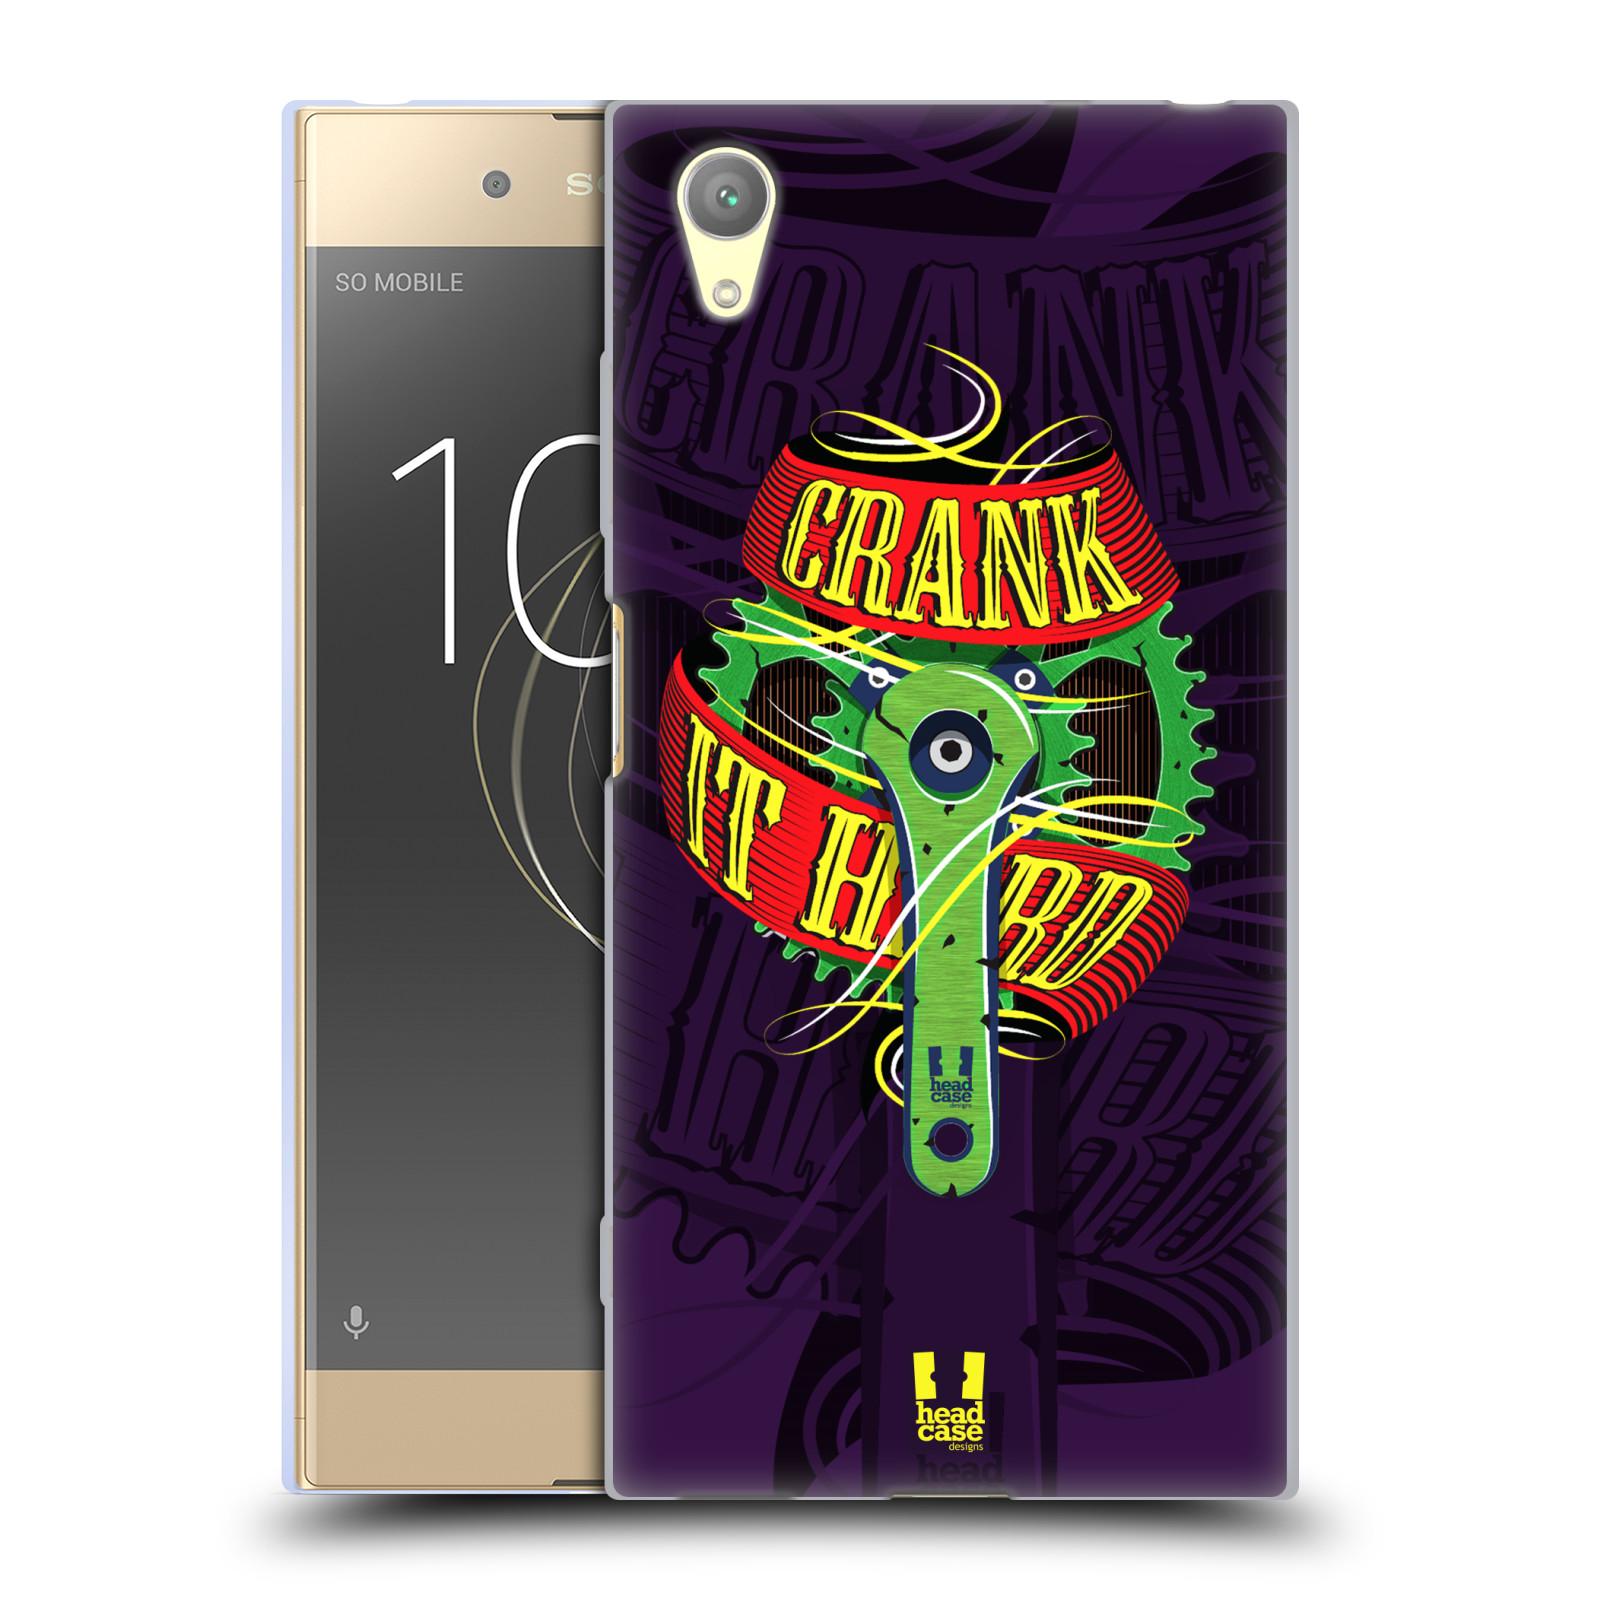 HEAD CASE silikonový obal na mobil Sony Xperia XA1 PLUS Cyklista pedály šlápni do toho CRANK IT HARD